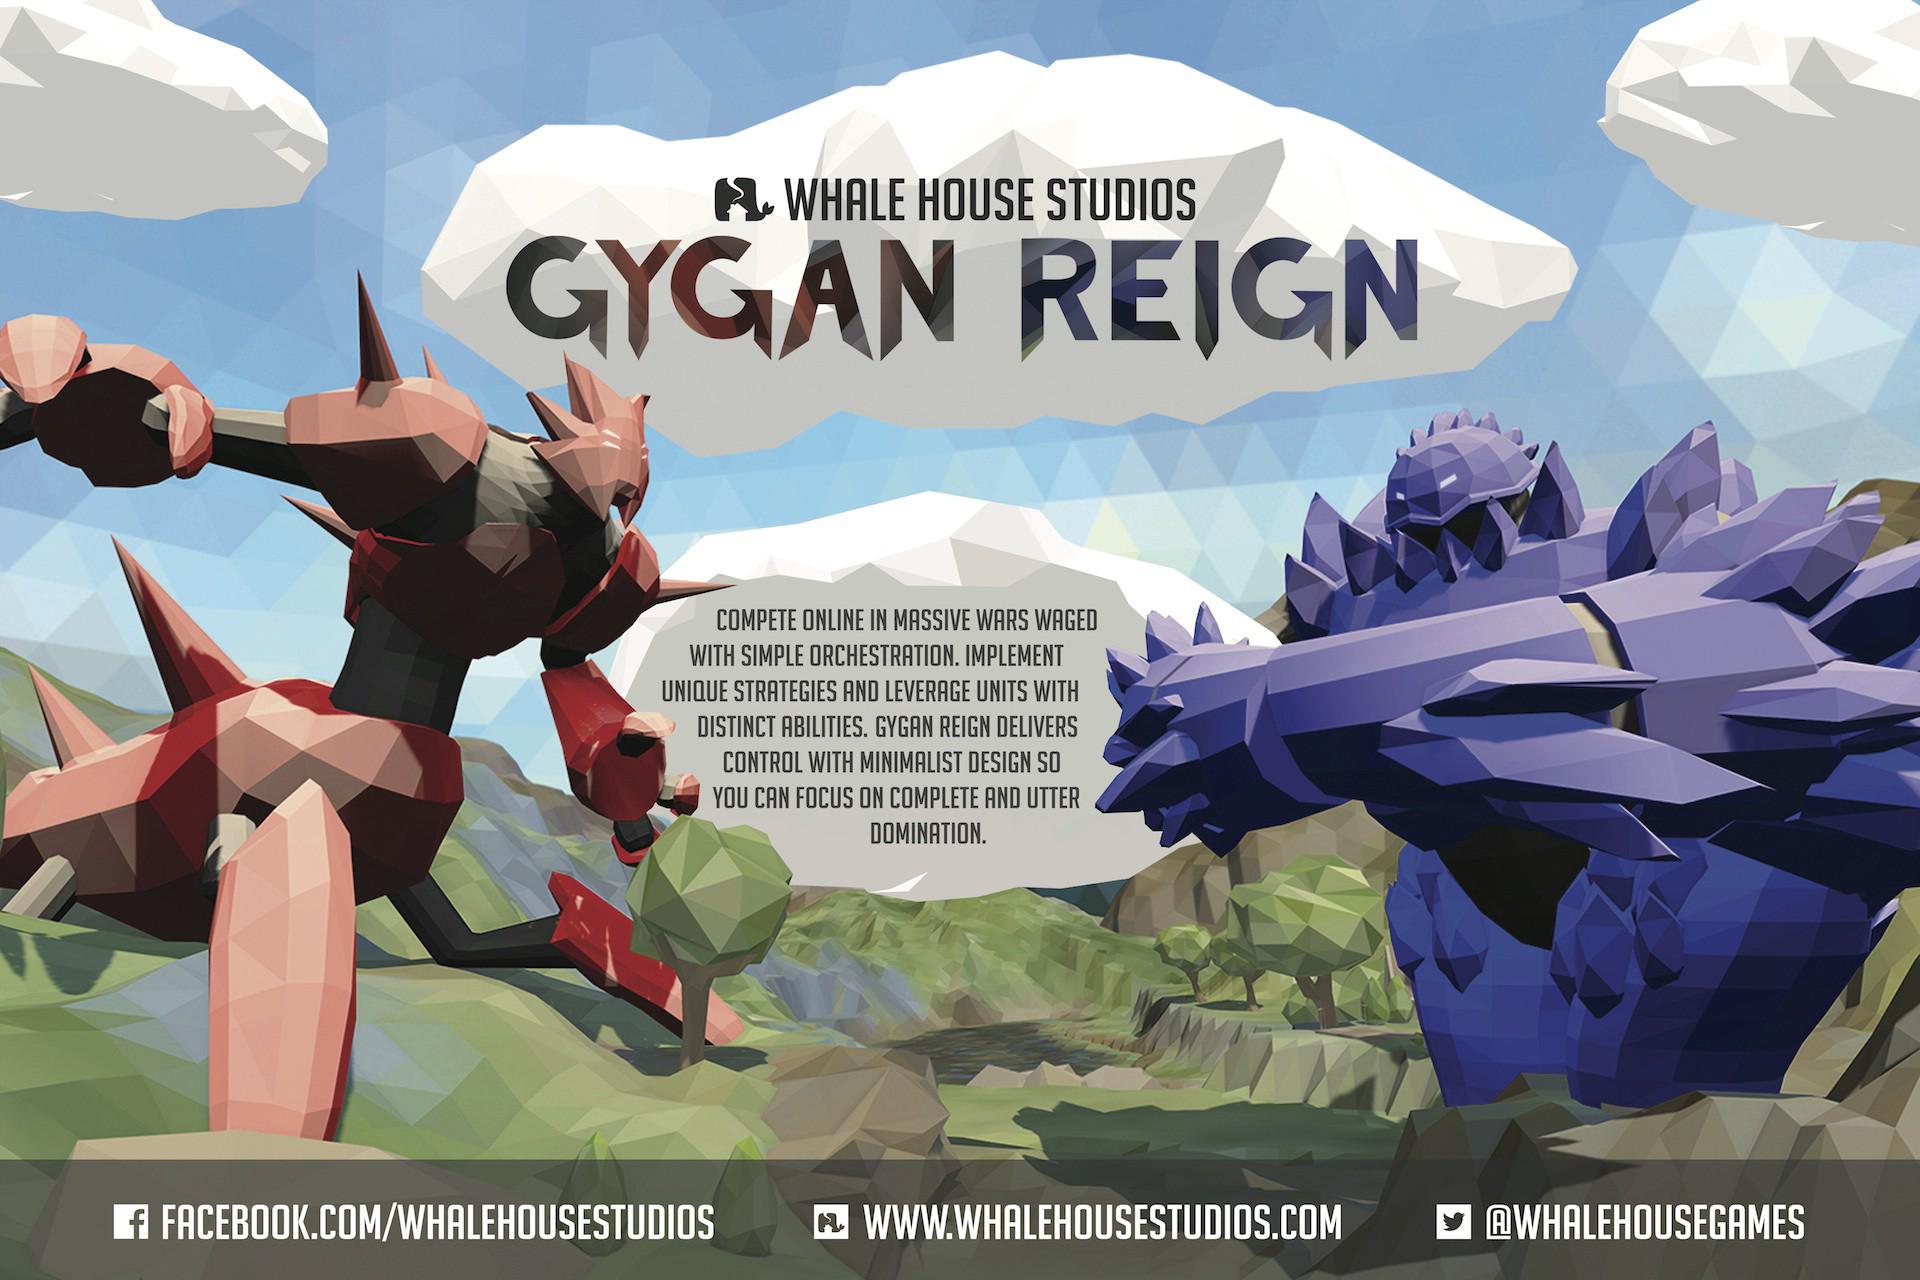 GyganReign.png